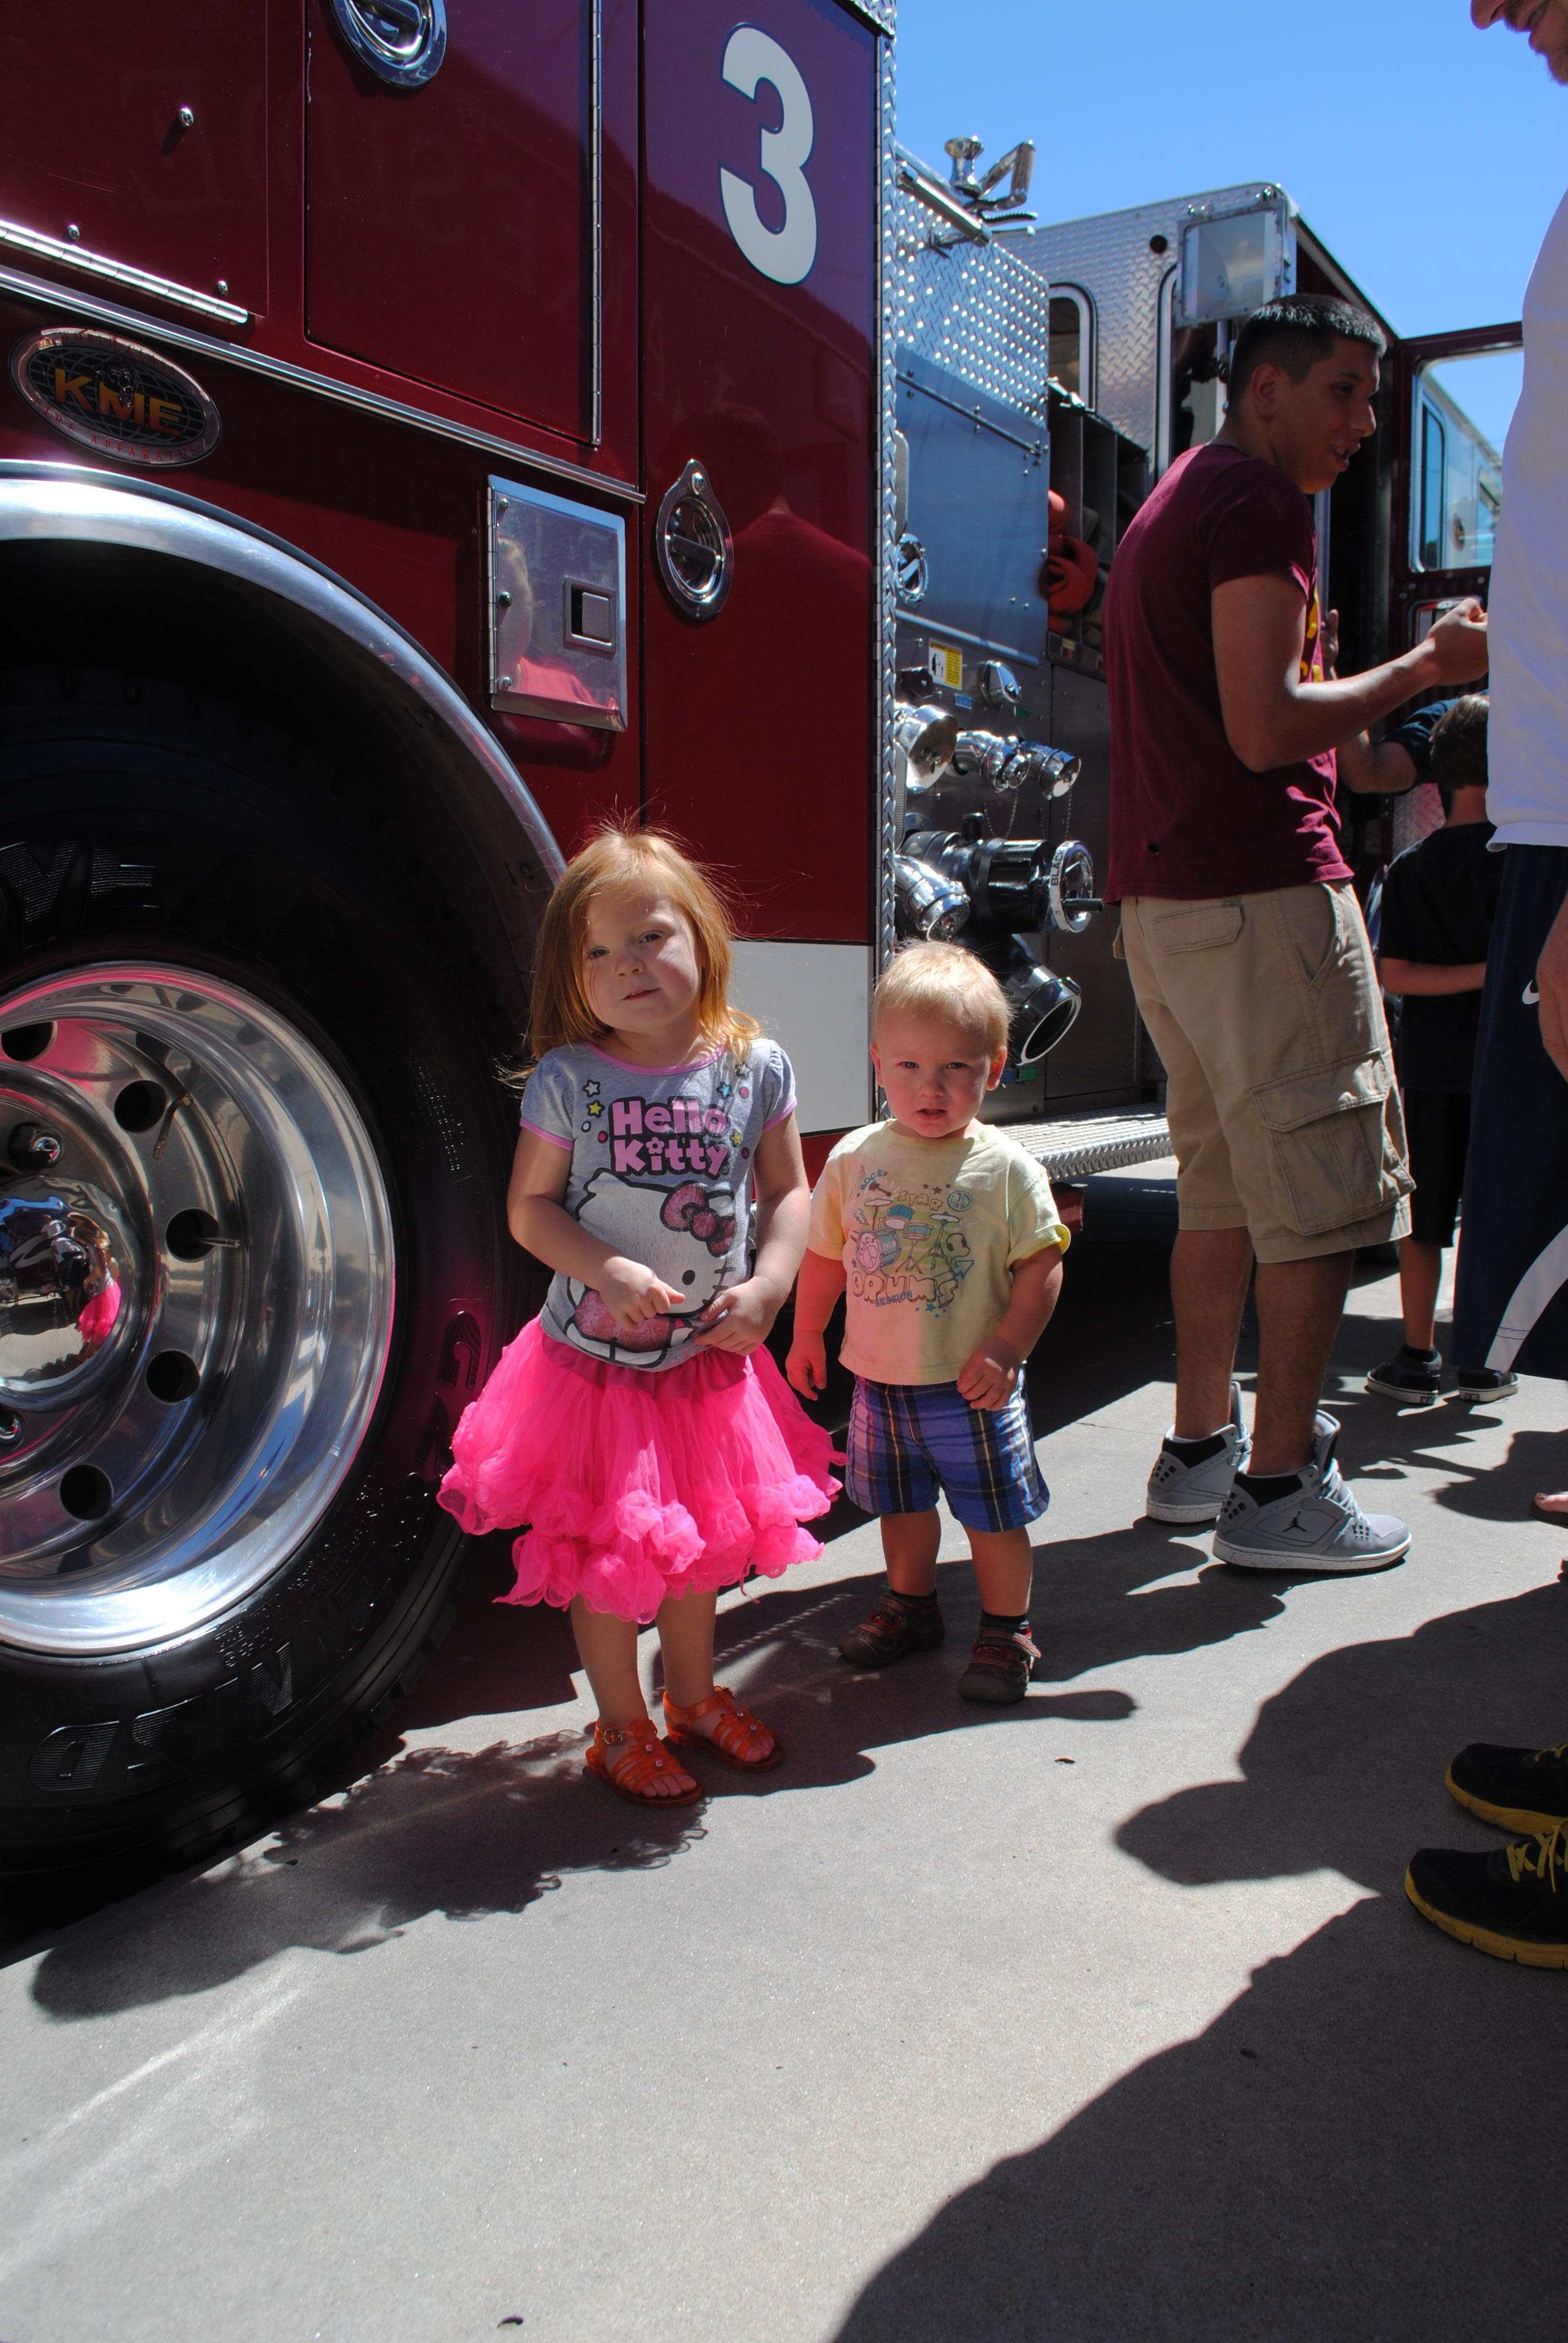 Firehouse 008